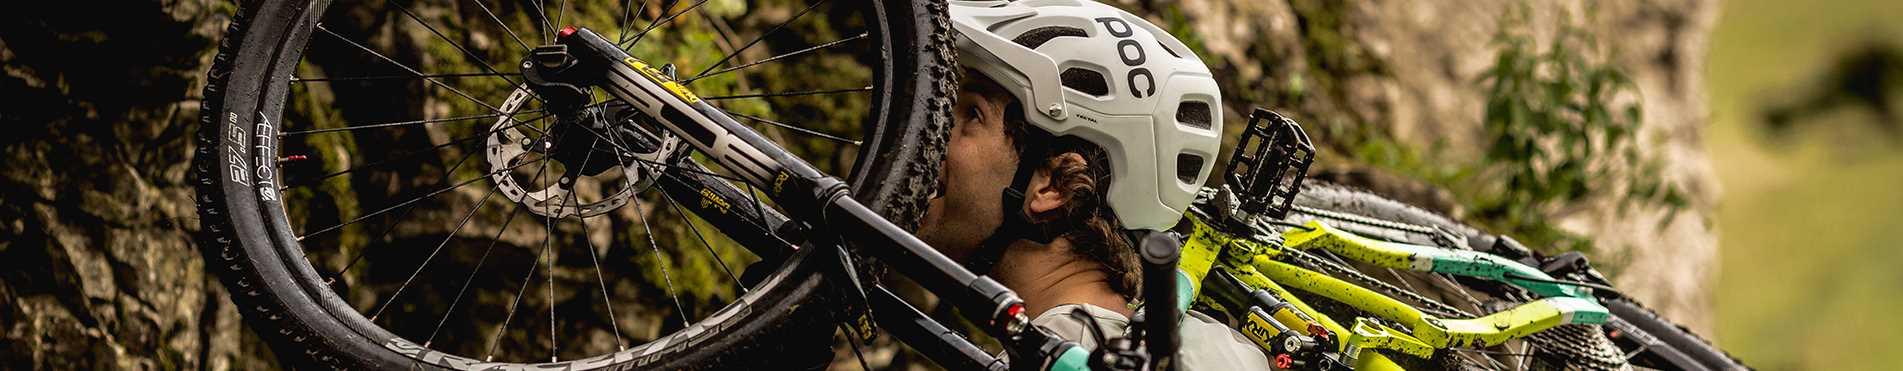 Enter my world - Zumbi Mountain bikes